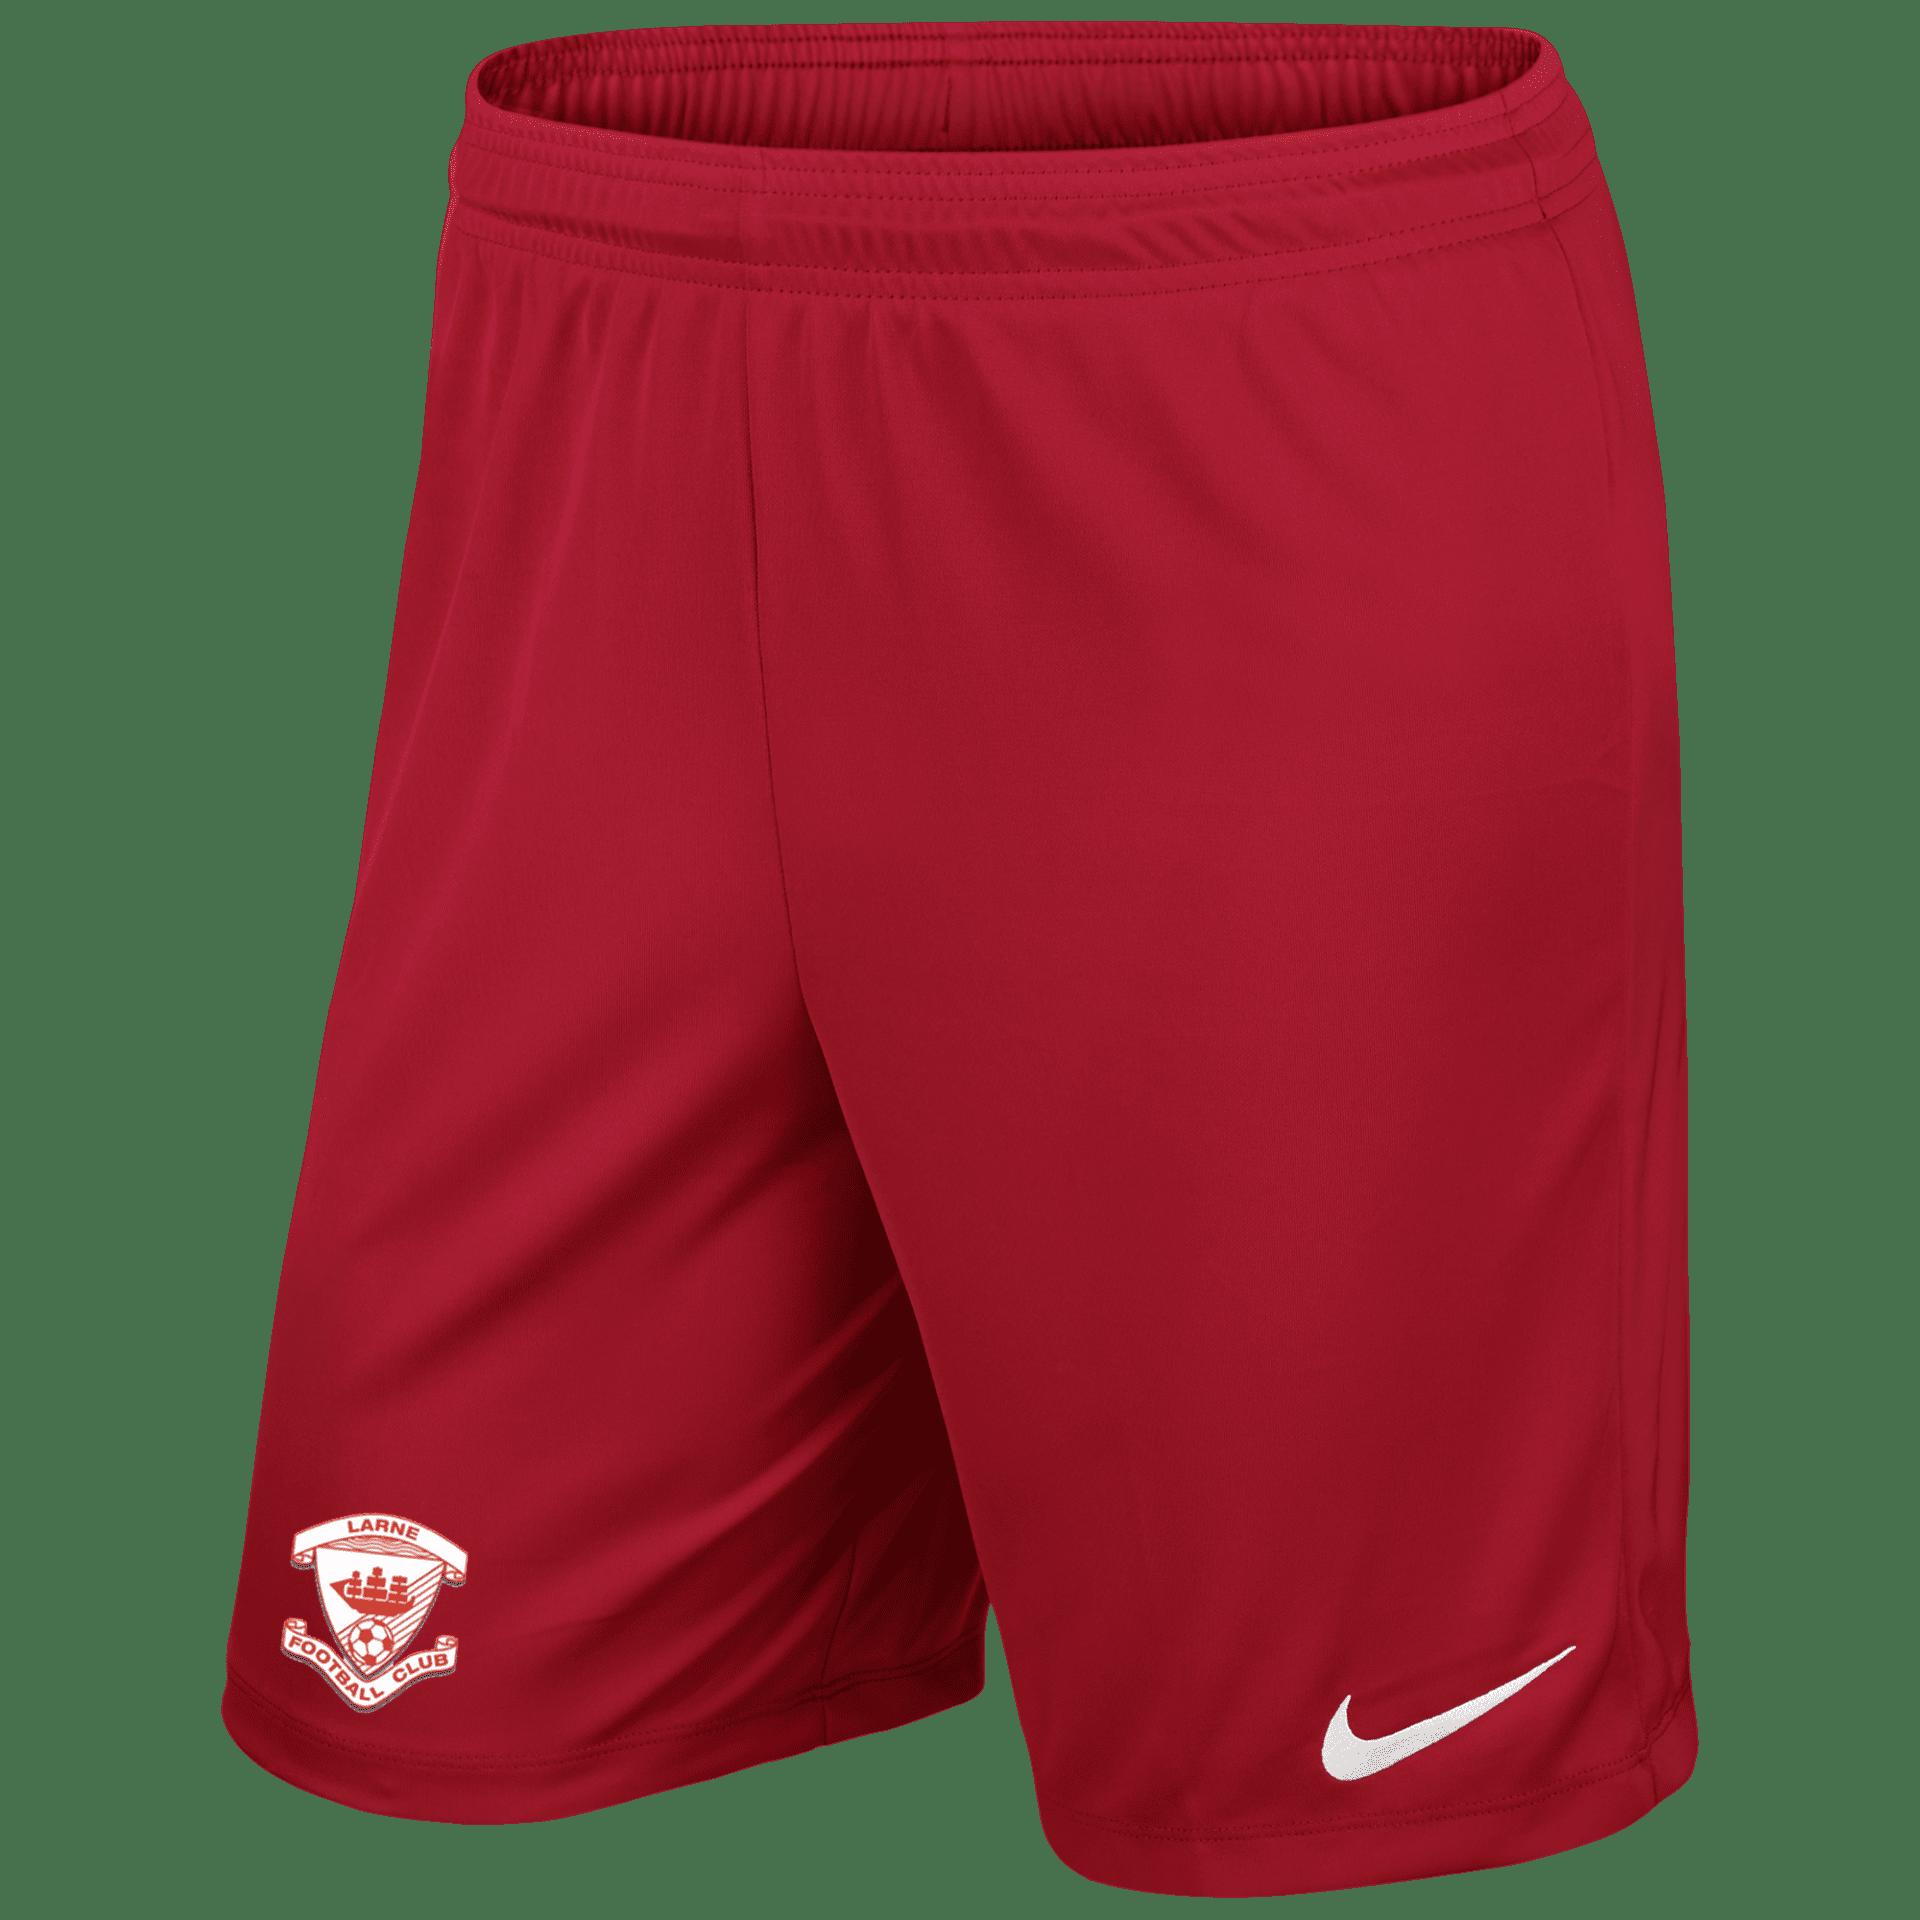 larne youth park shorts 34889 1 p